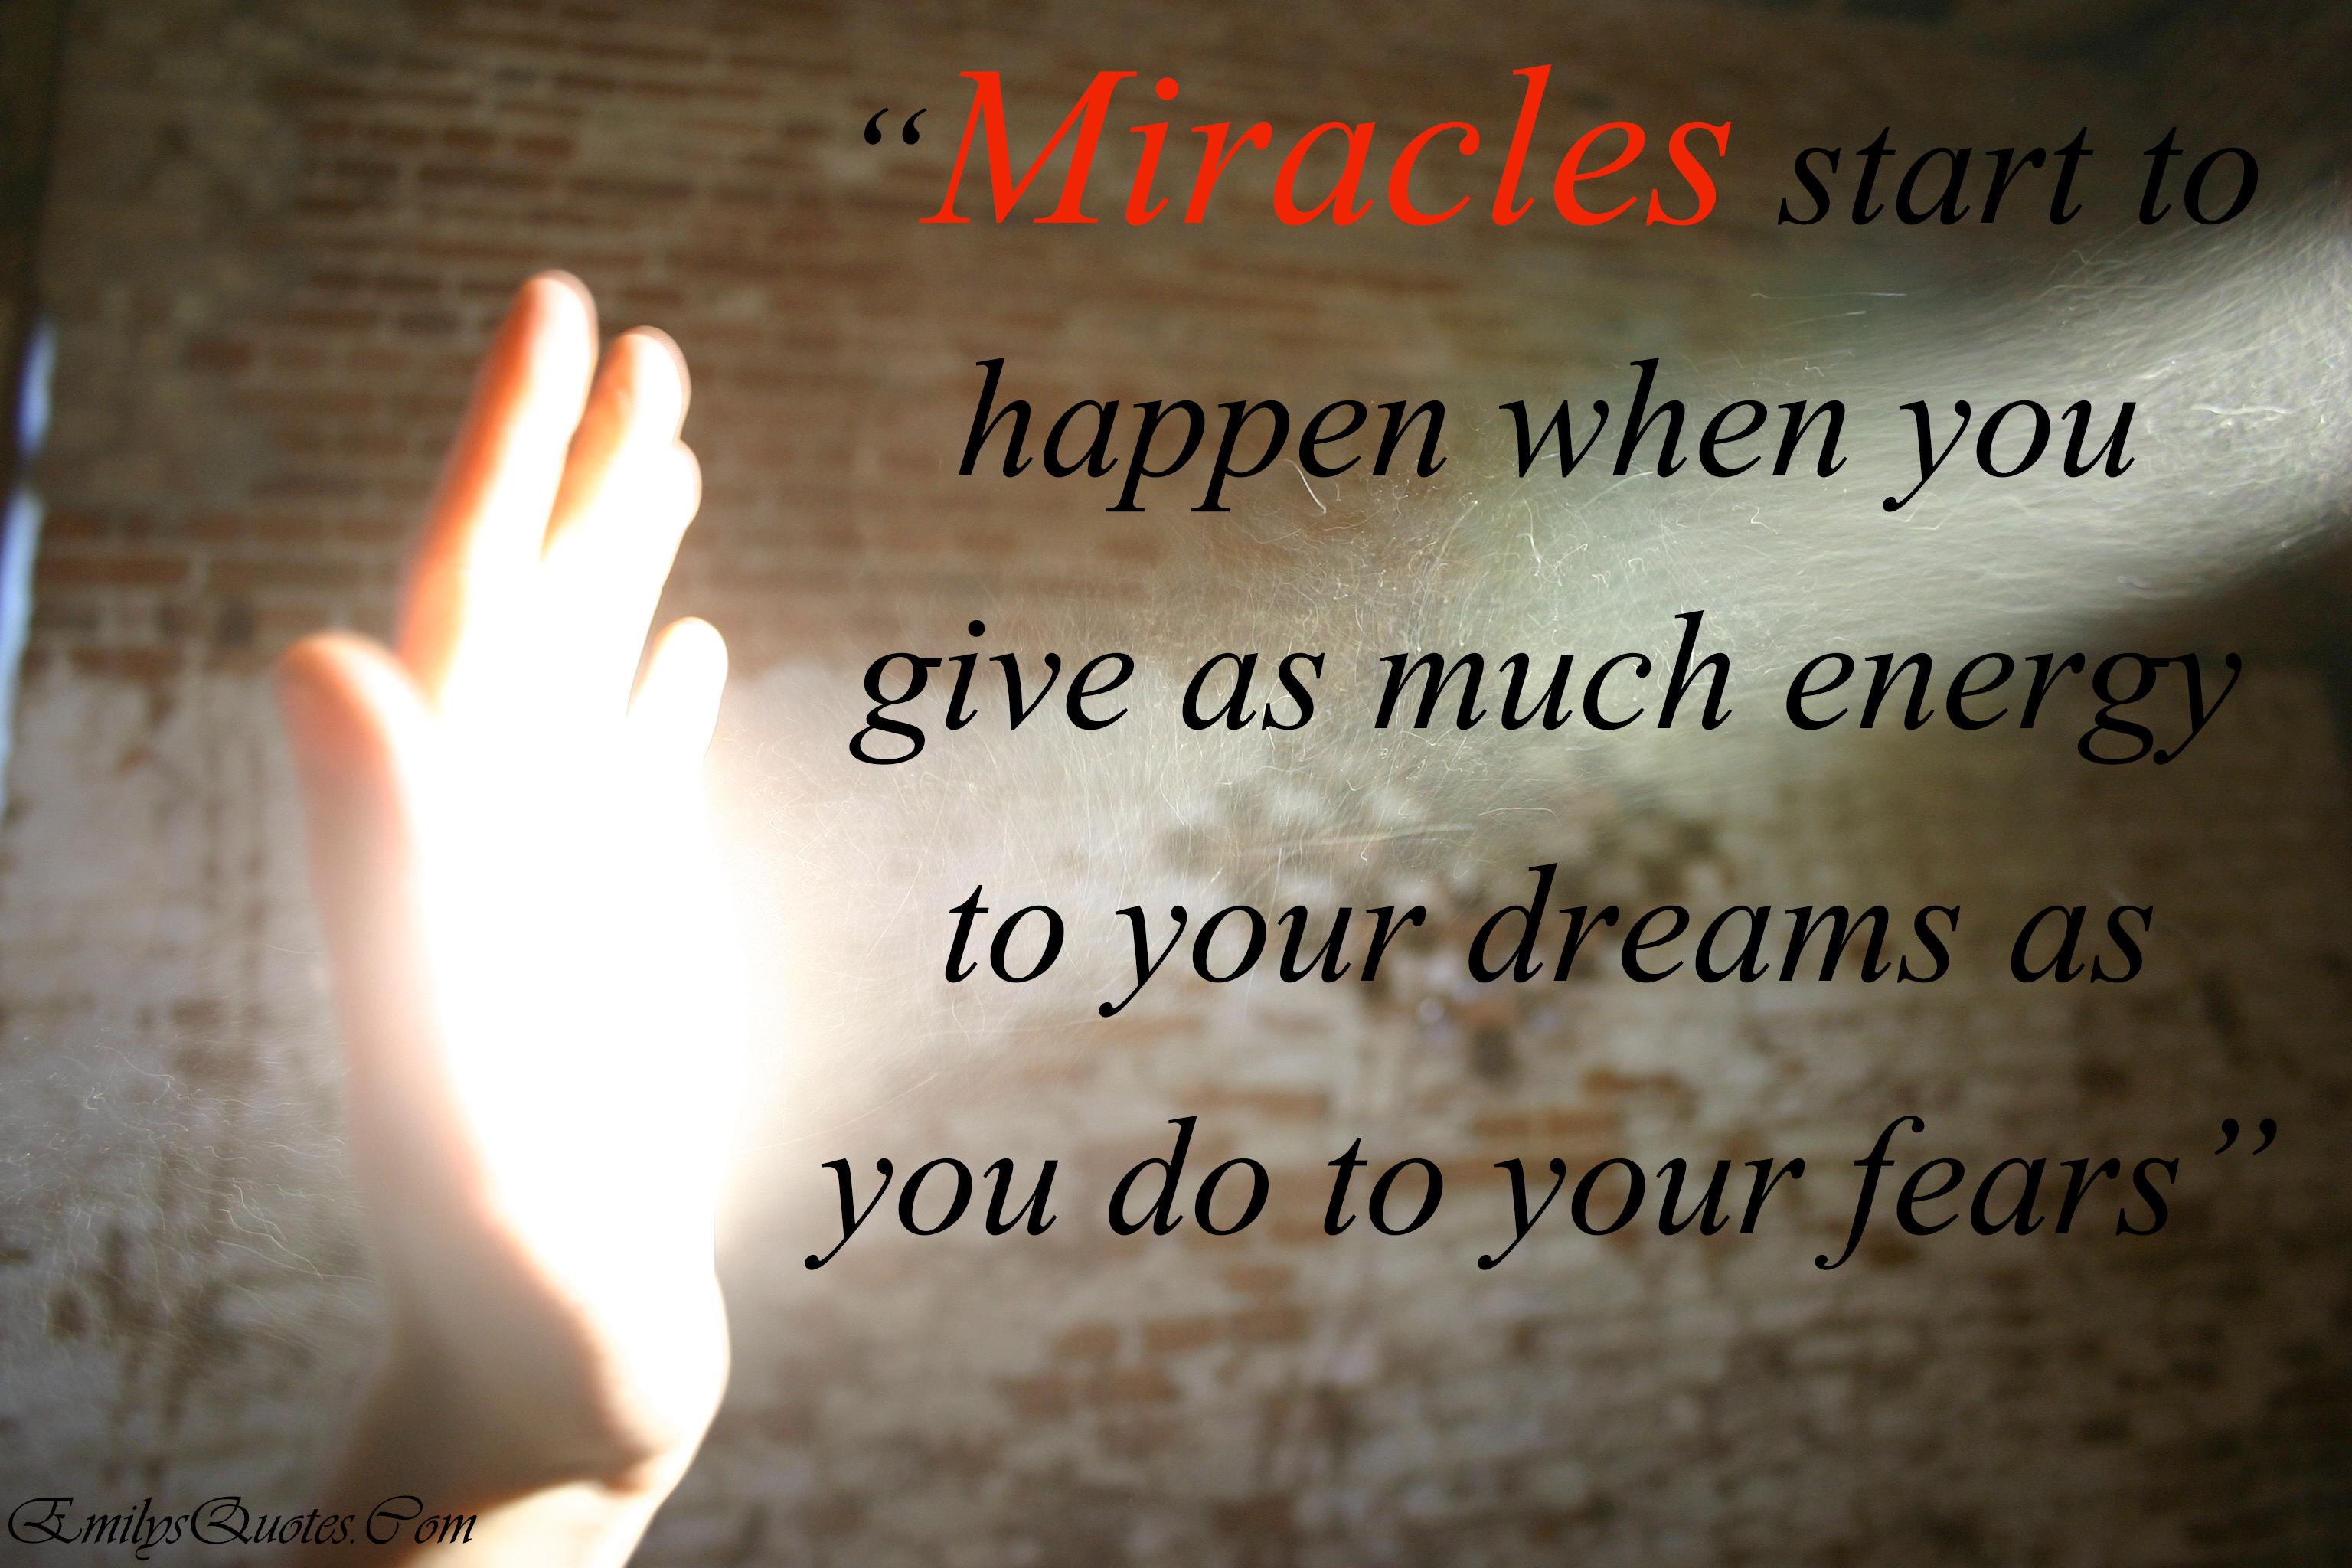 EmilysQuotes.Com - miracle, dreams, fear, energy, inspirational